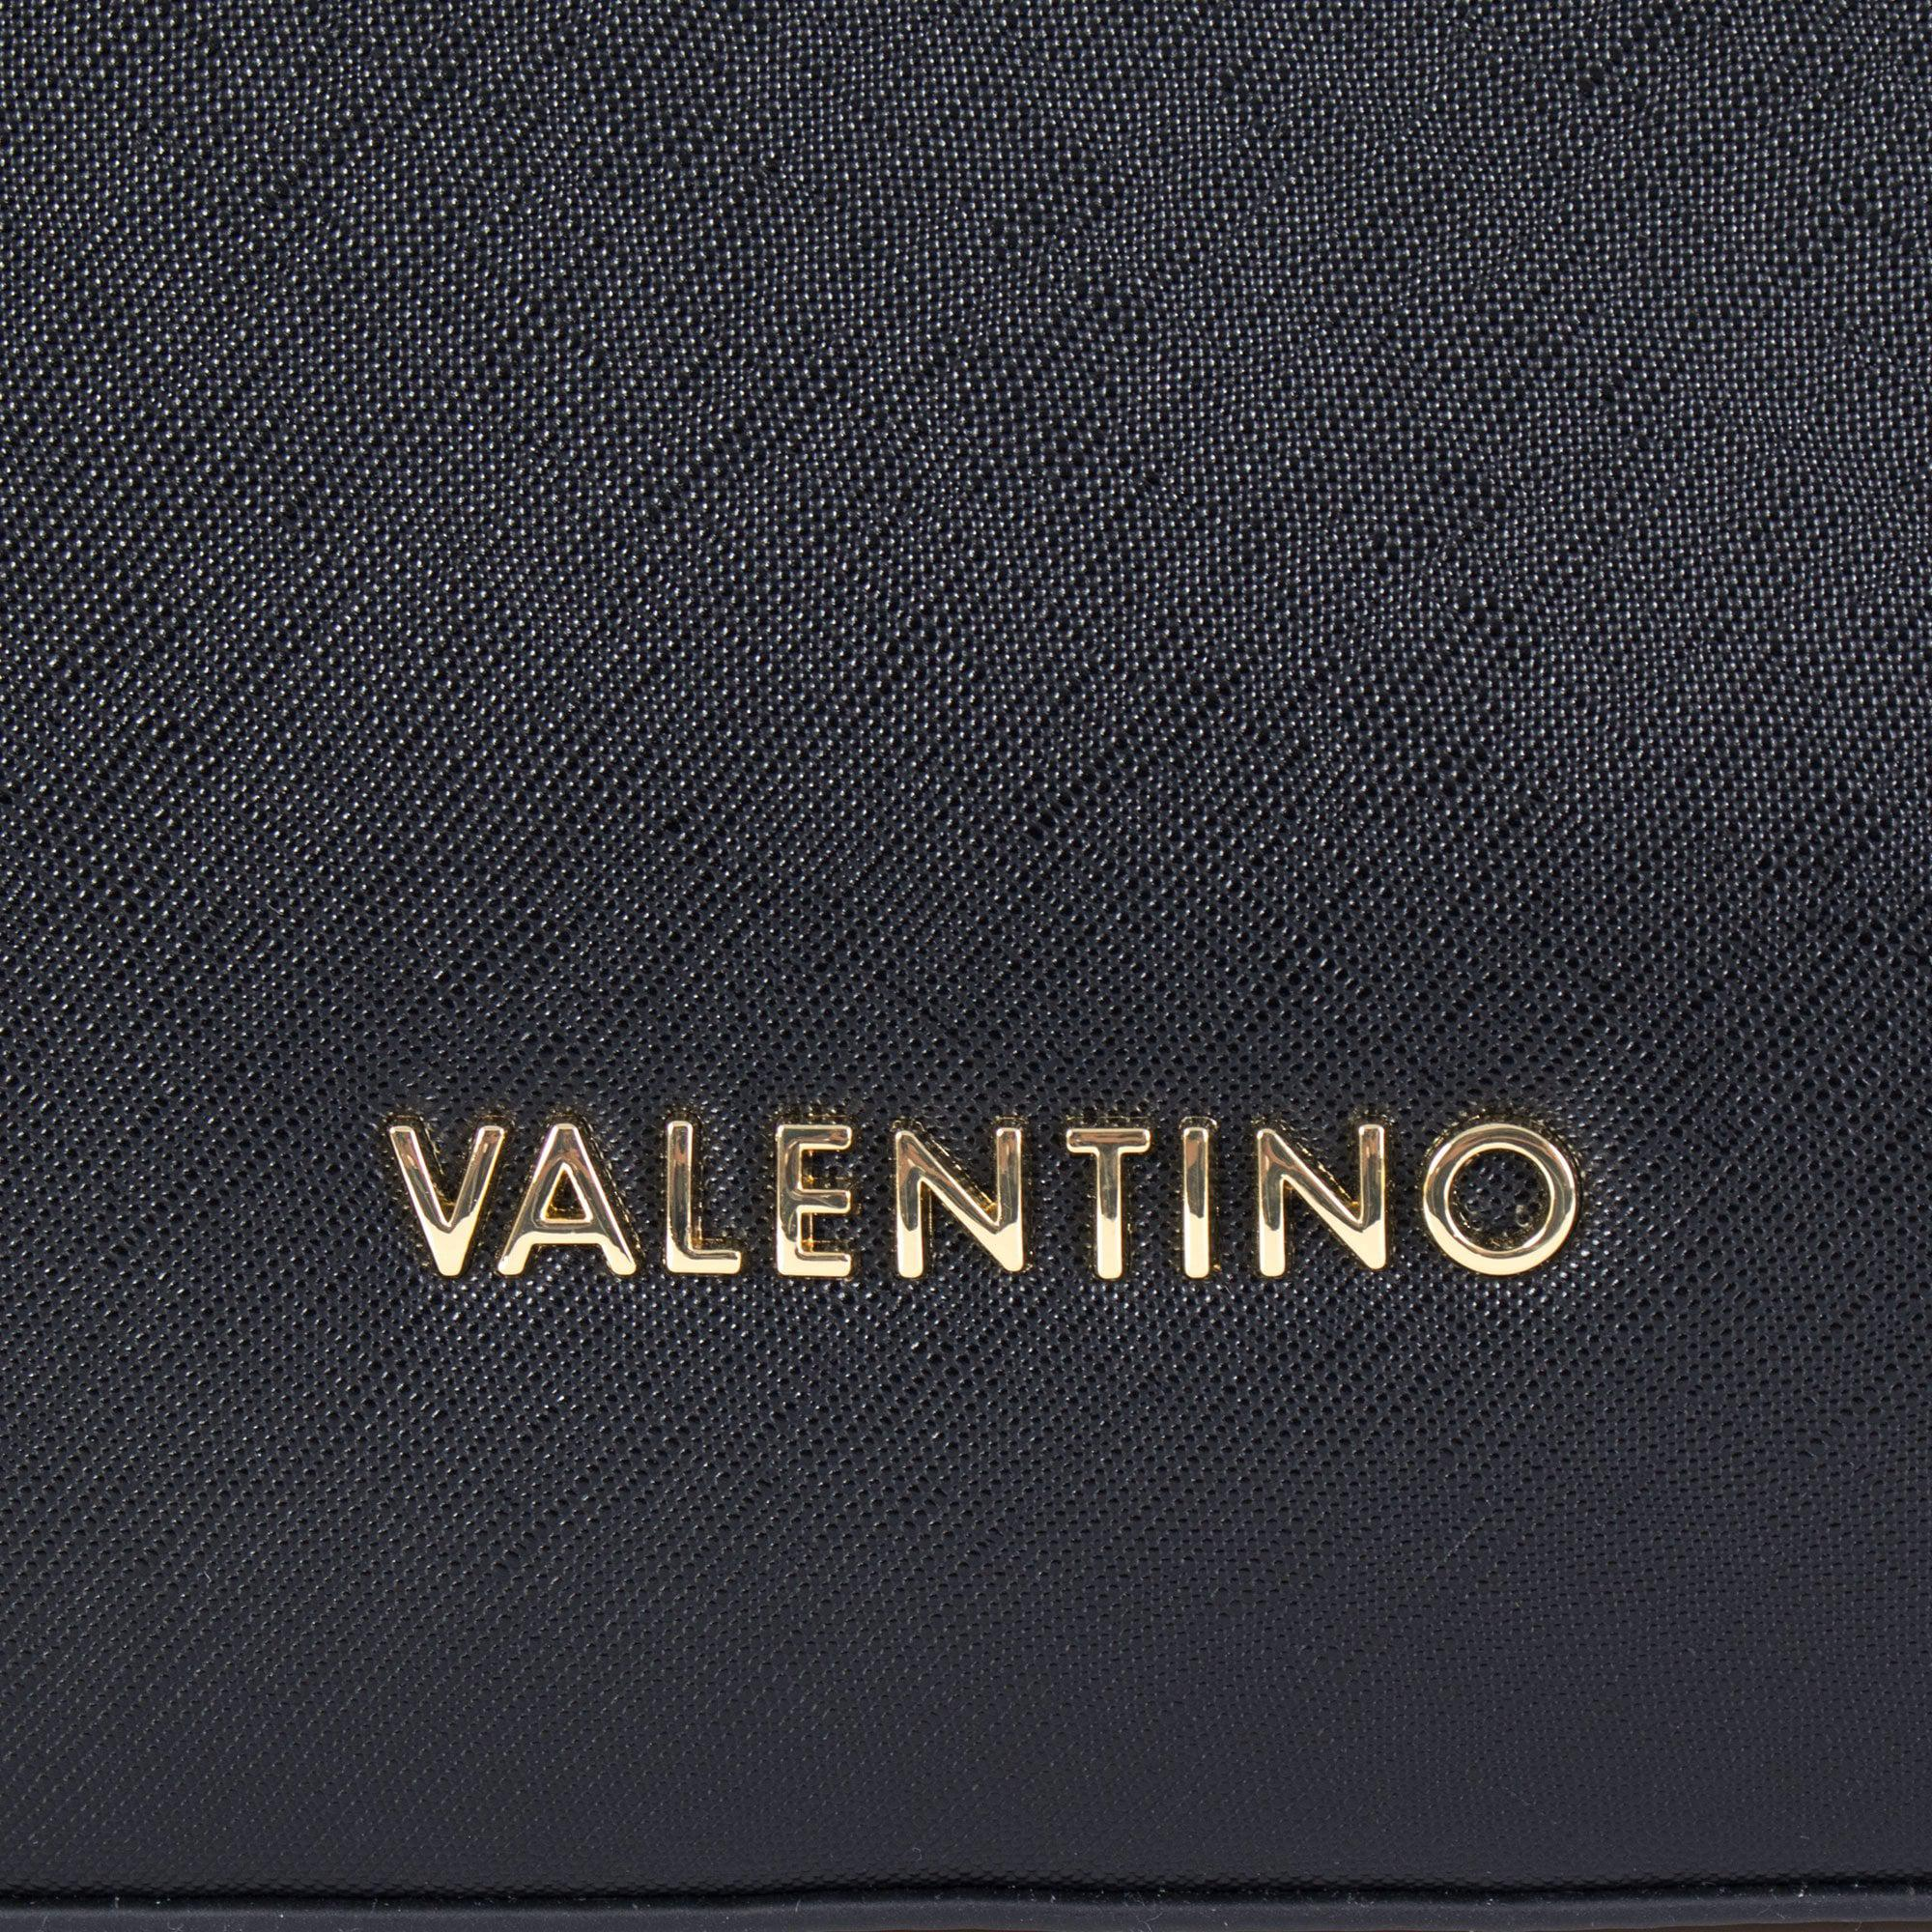 509b8b4eb3bf Valentino Metropolis Crosshatch Tote in Black - Lyst